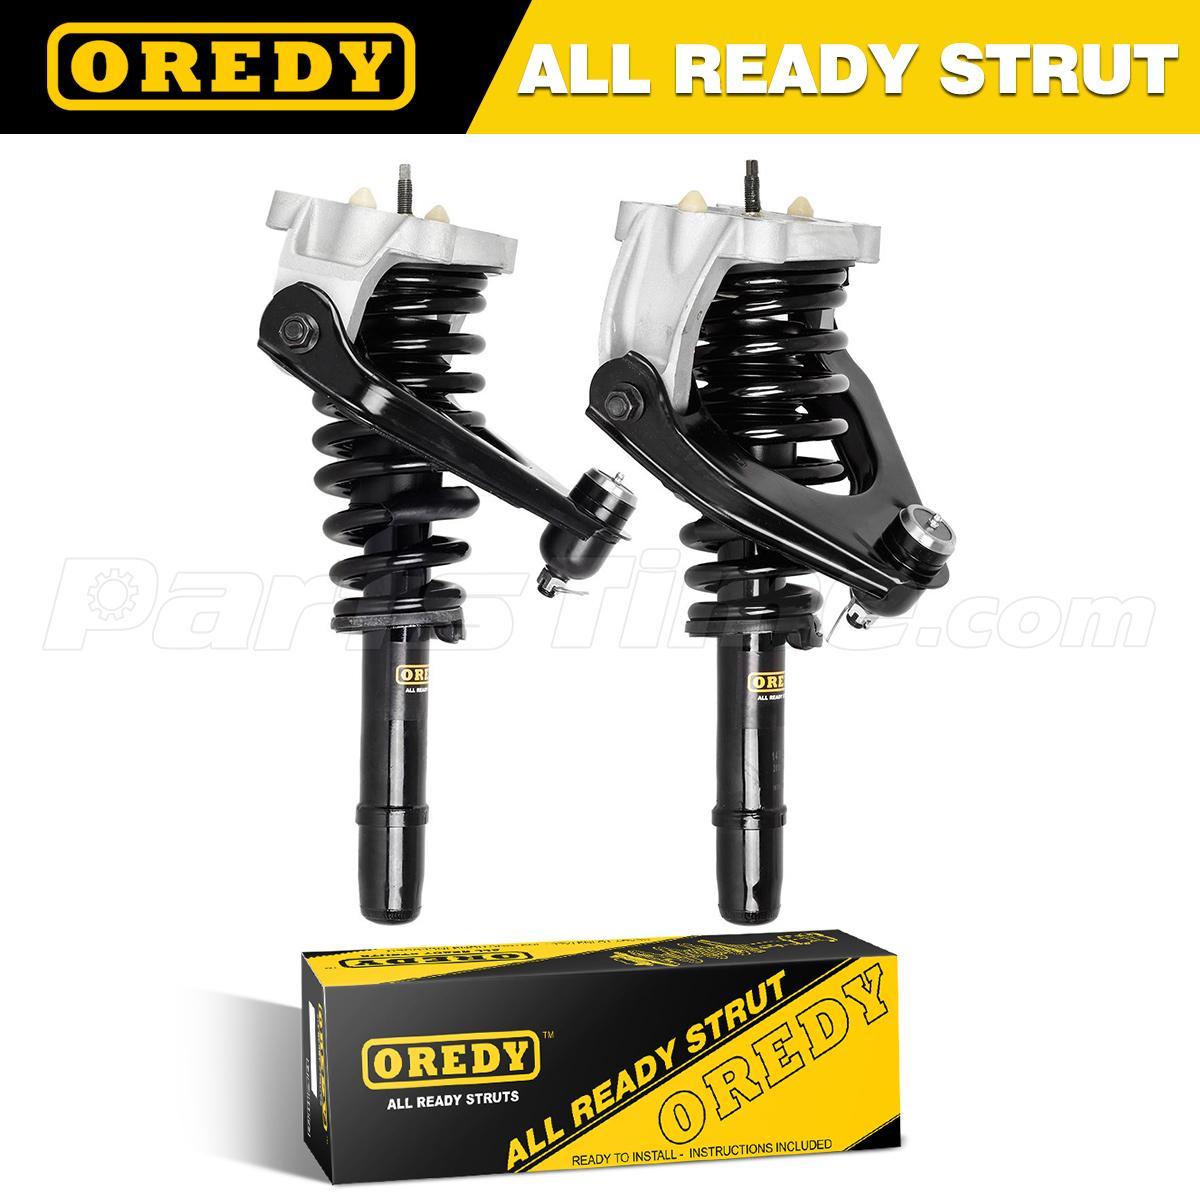 Front Complete Struts /& Rear Shock Assemblies for 99-00 Chrysler Cirrus Sedan